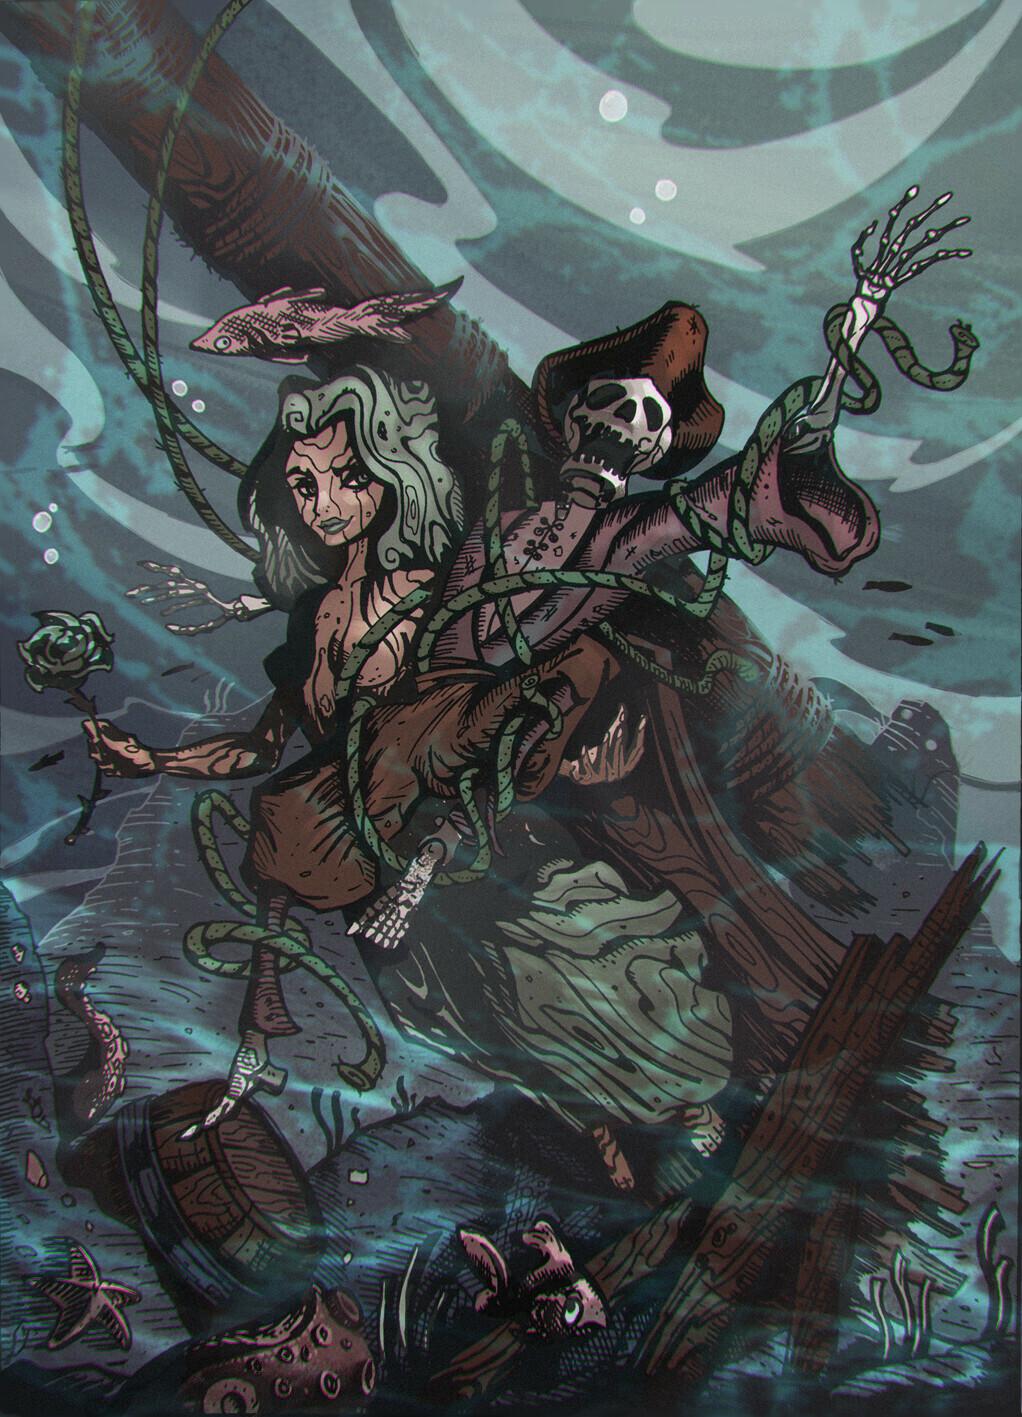 Capt Spooky and Rosepike